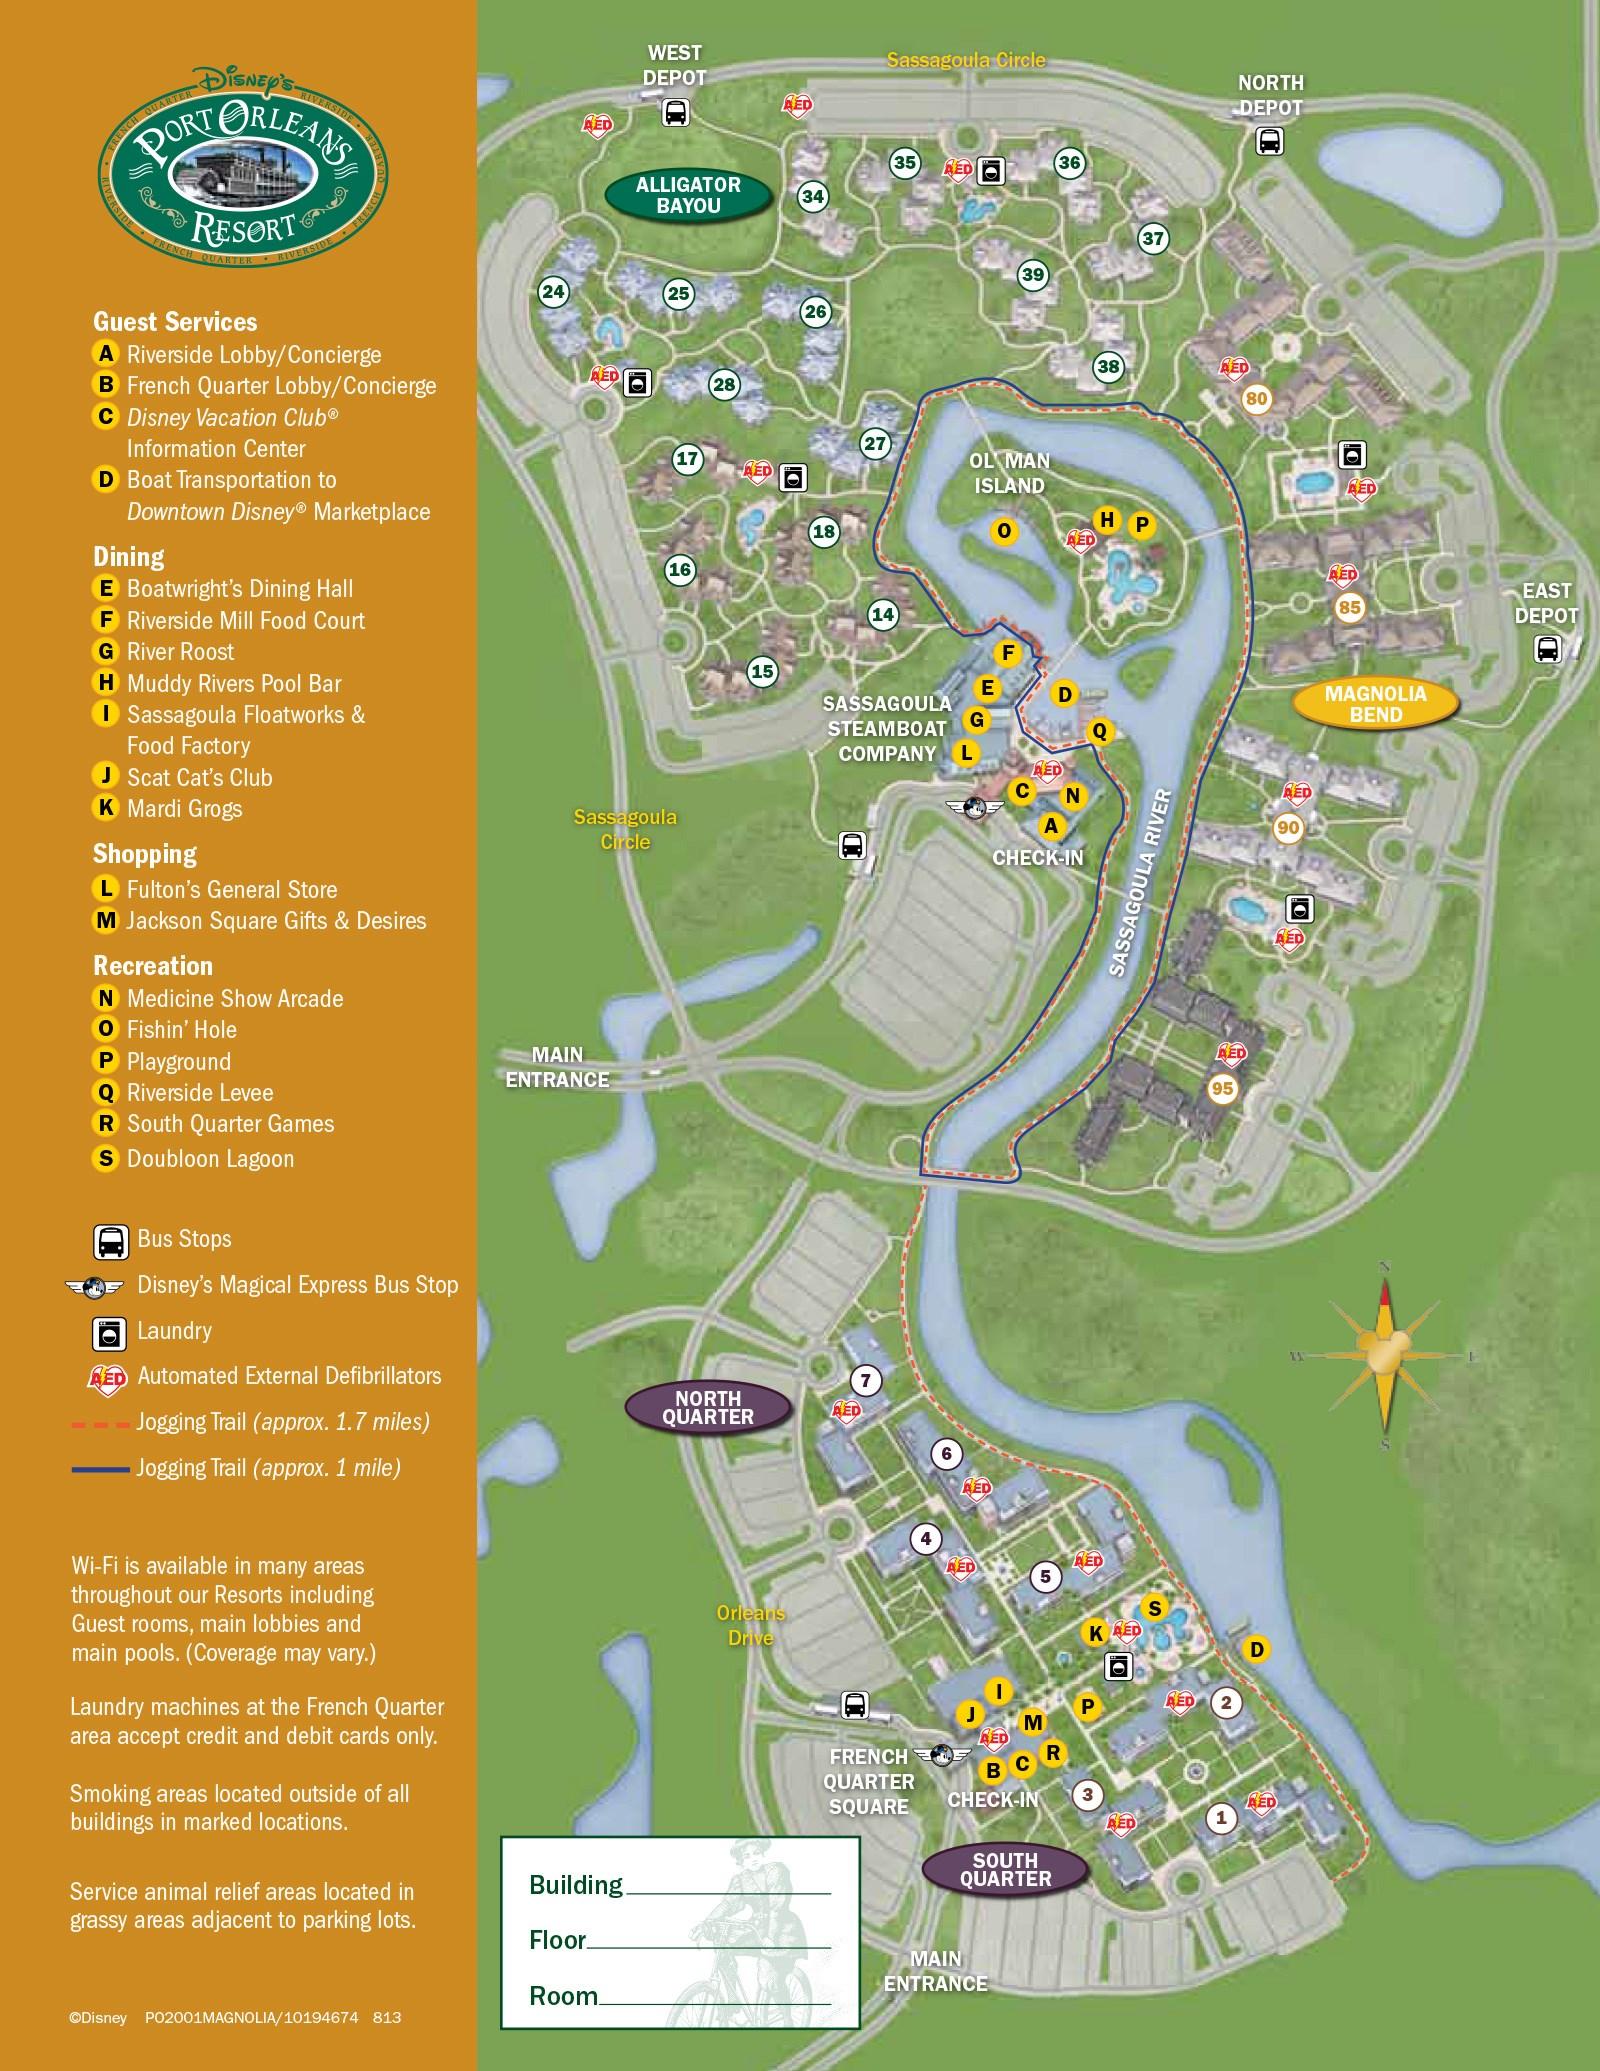 2013 Port Orleans Riverside guide map